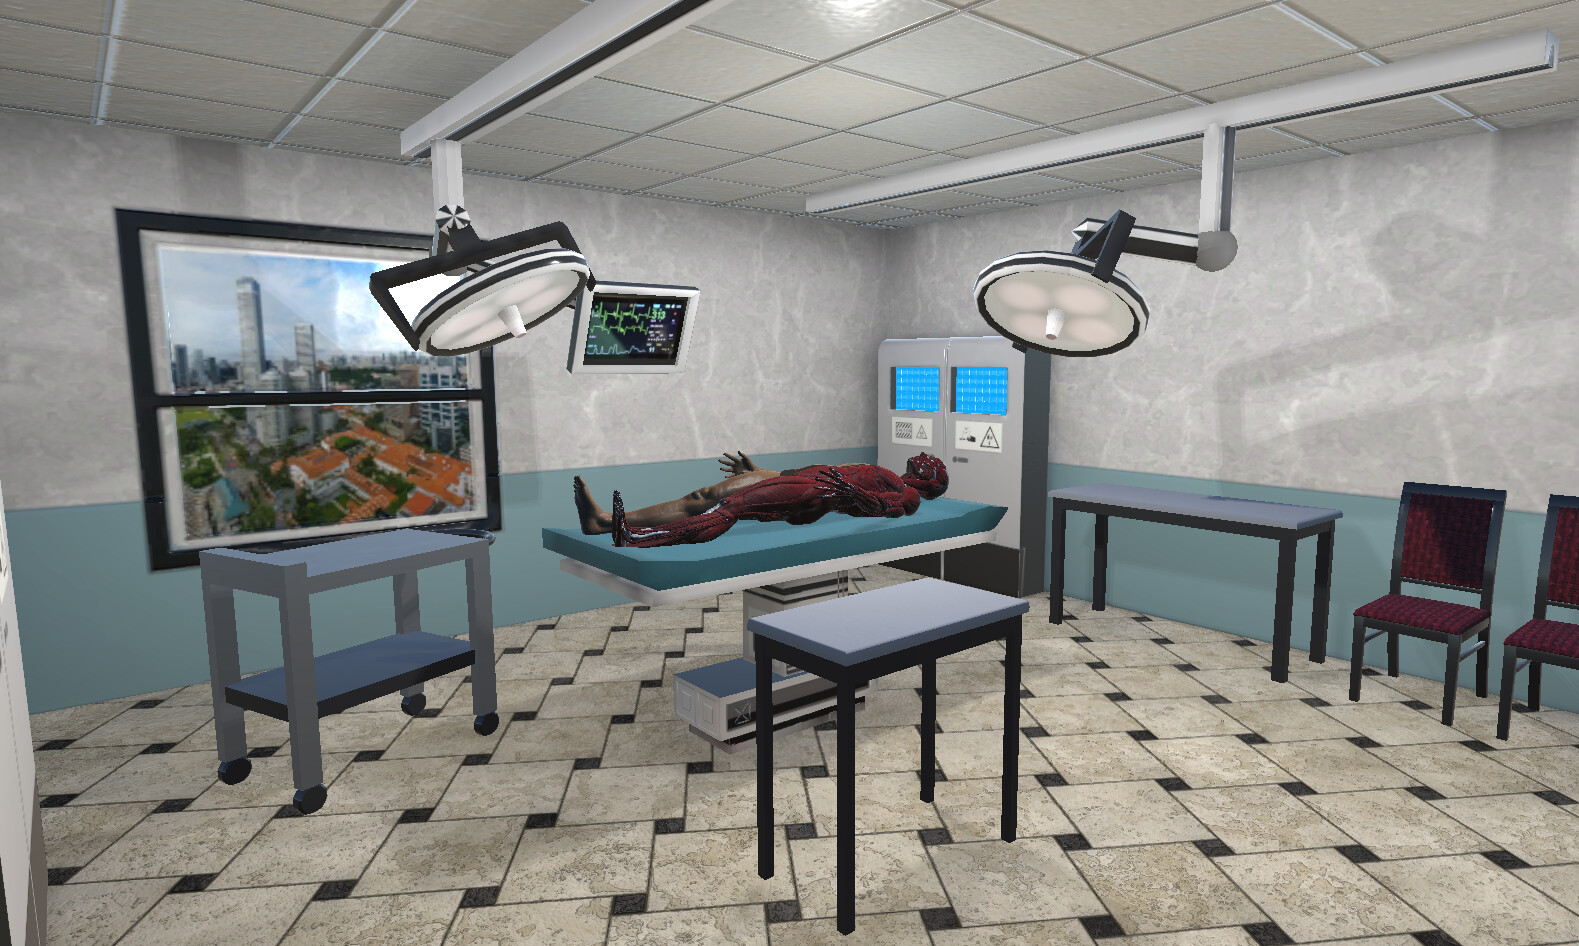 VR Hospital Examination 1 - In Engine